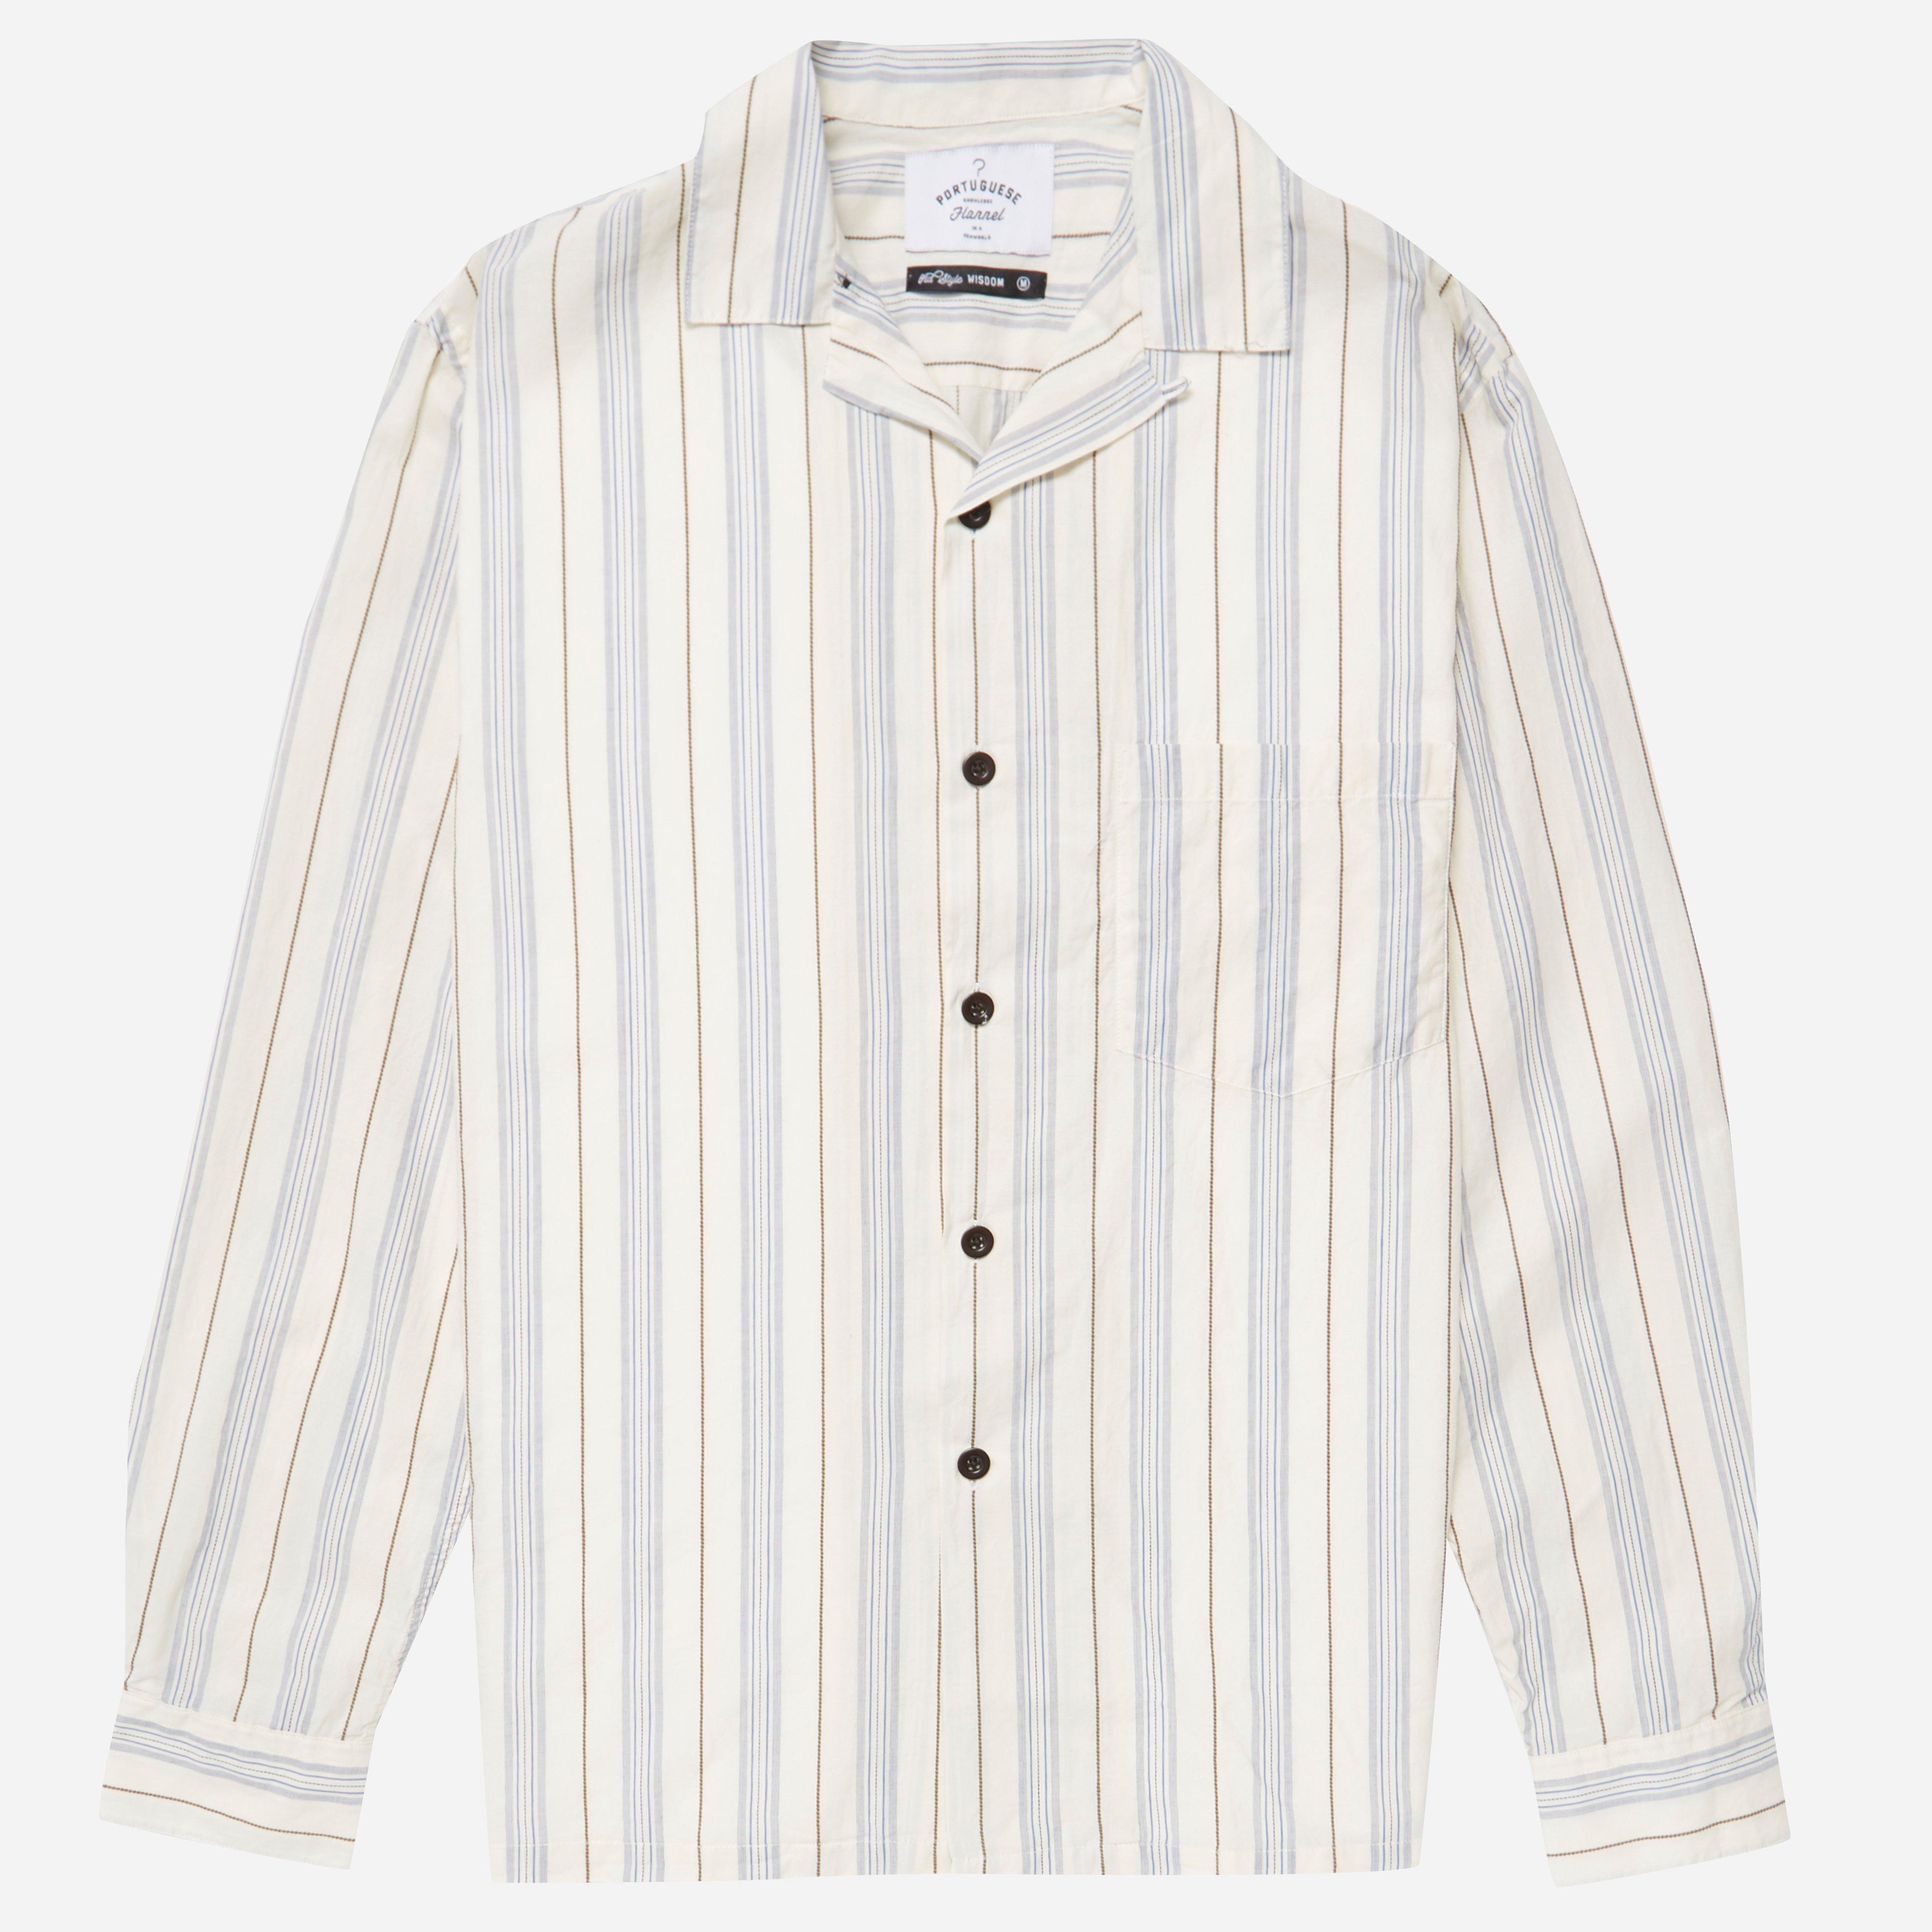 Portuguese Flannel Salvador Shirt